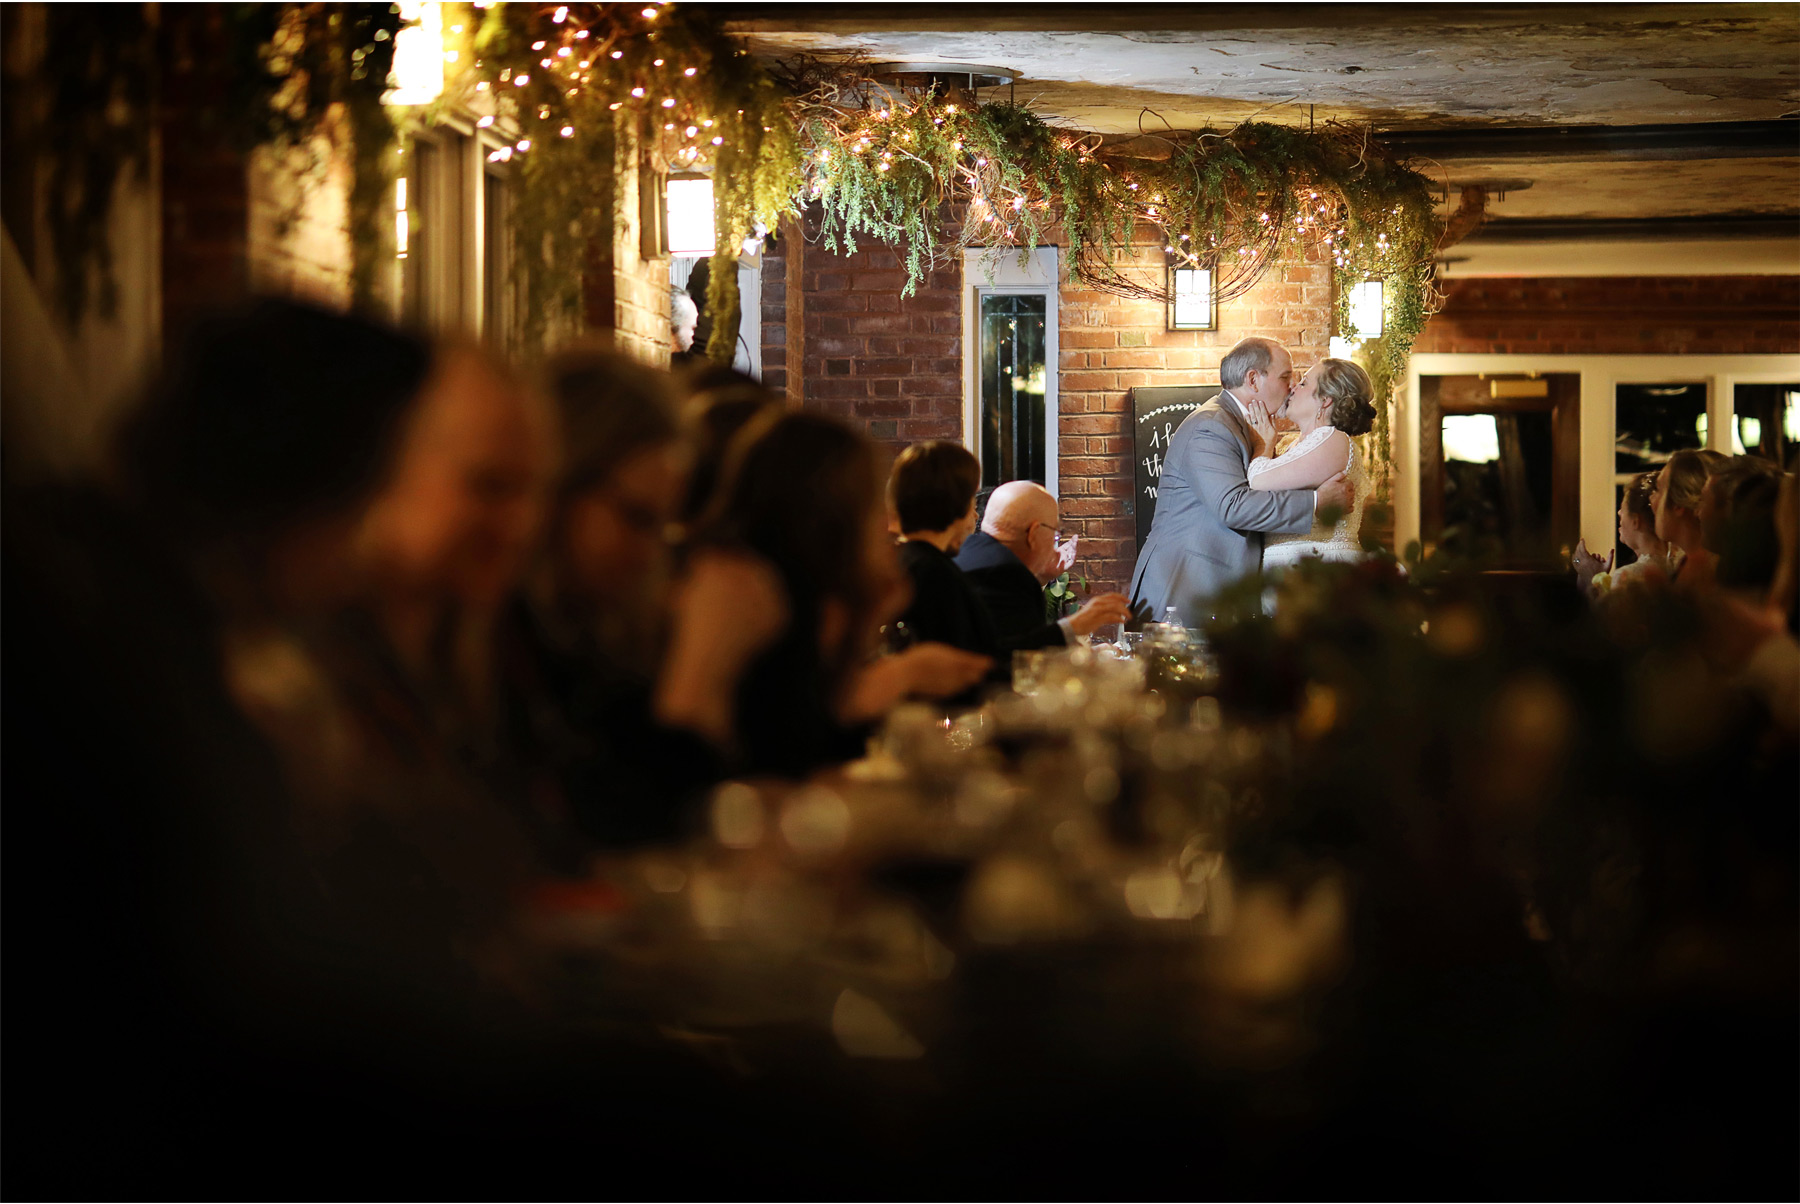 20-Duluth-Minnesota-Wedding-Photography-by-Vick-Photography-Glensheen-Mansion-Reception-Kelli-and-Marc.jpg